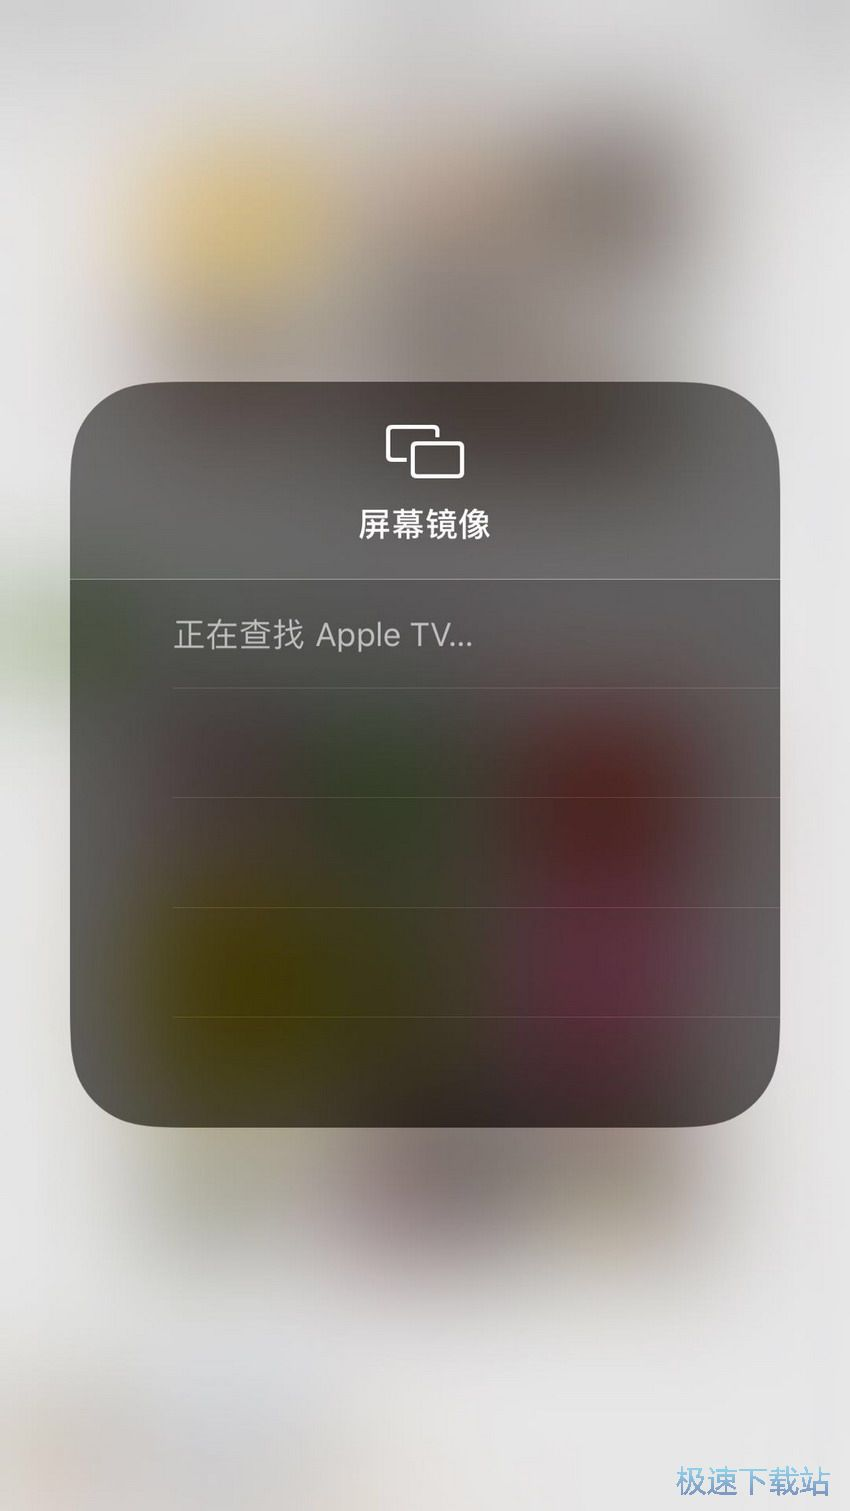 iPhone投屏(屏幕镜像)功能无法关闭怎么解决? 缩略图